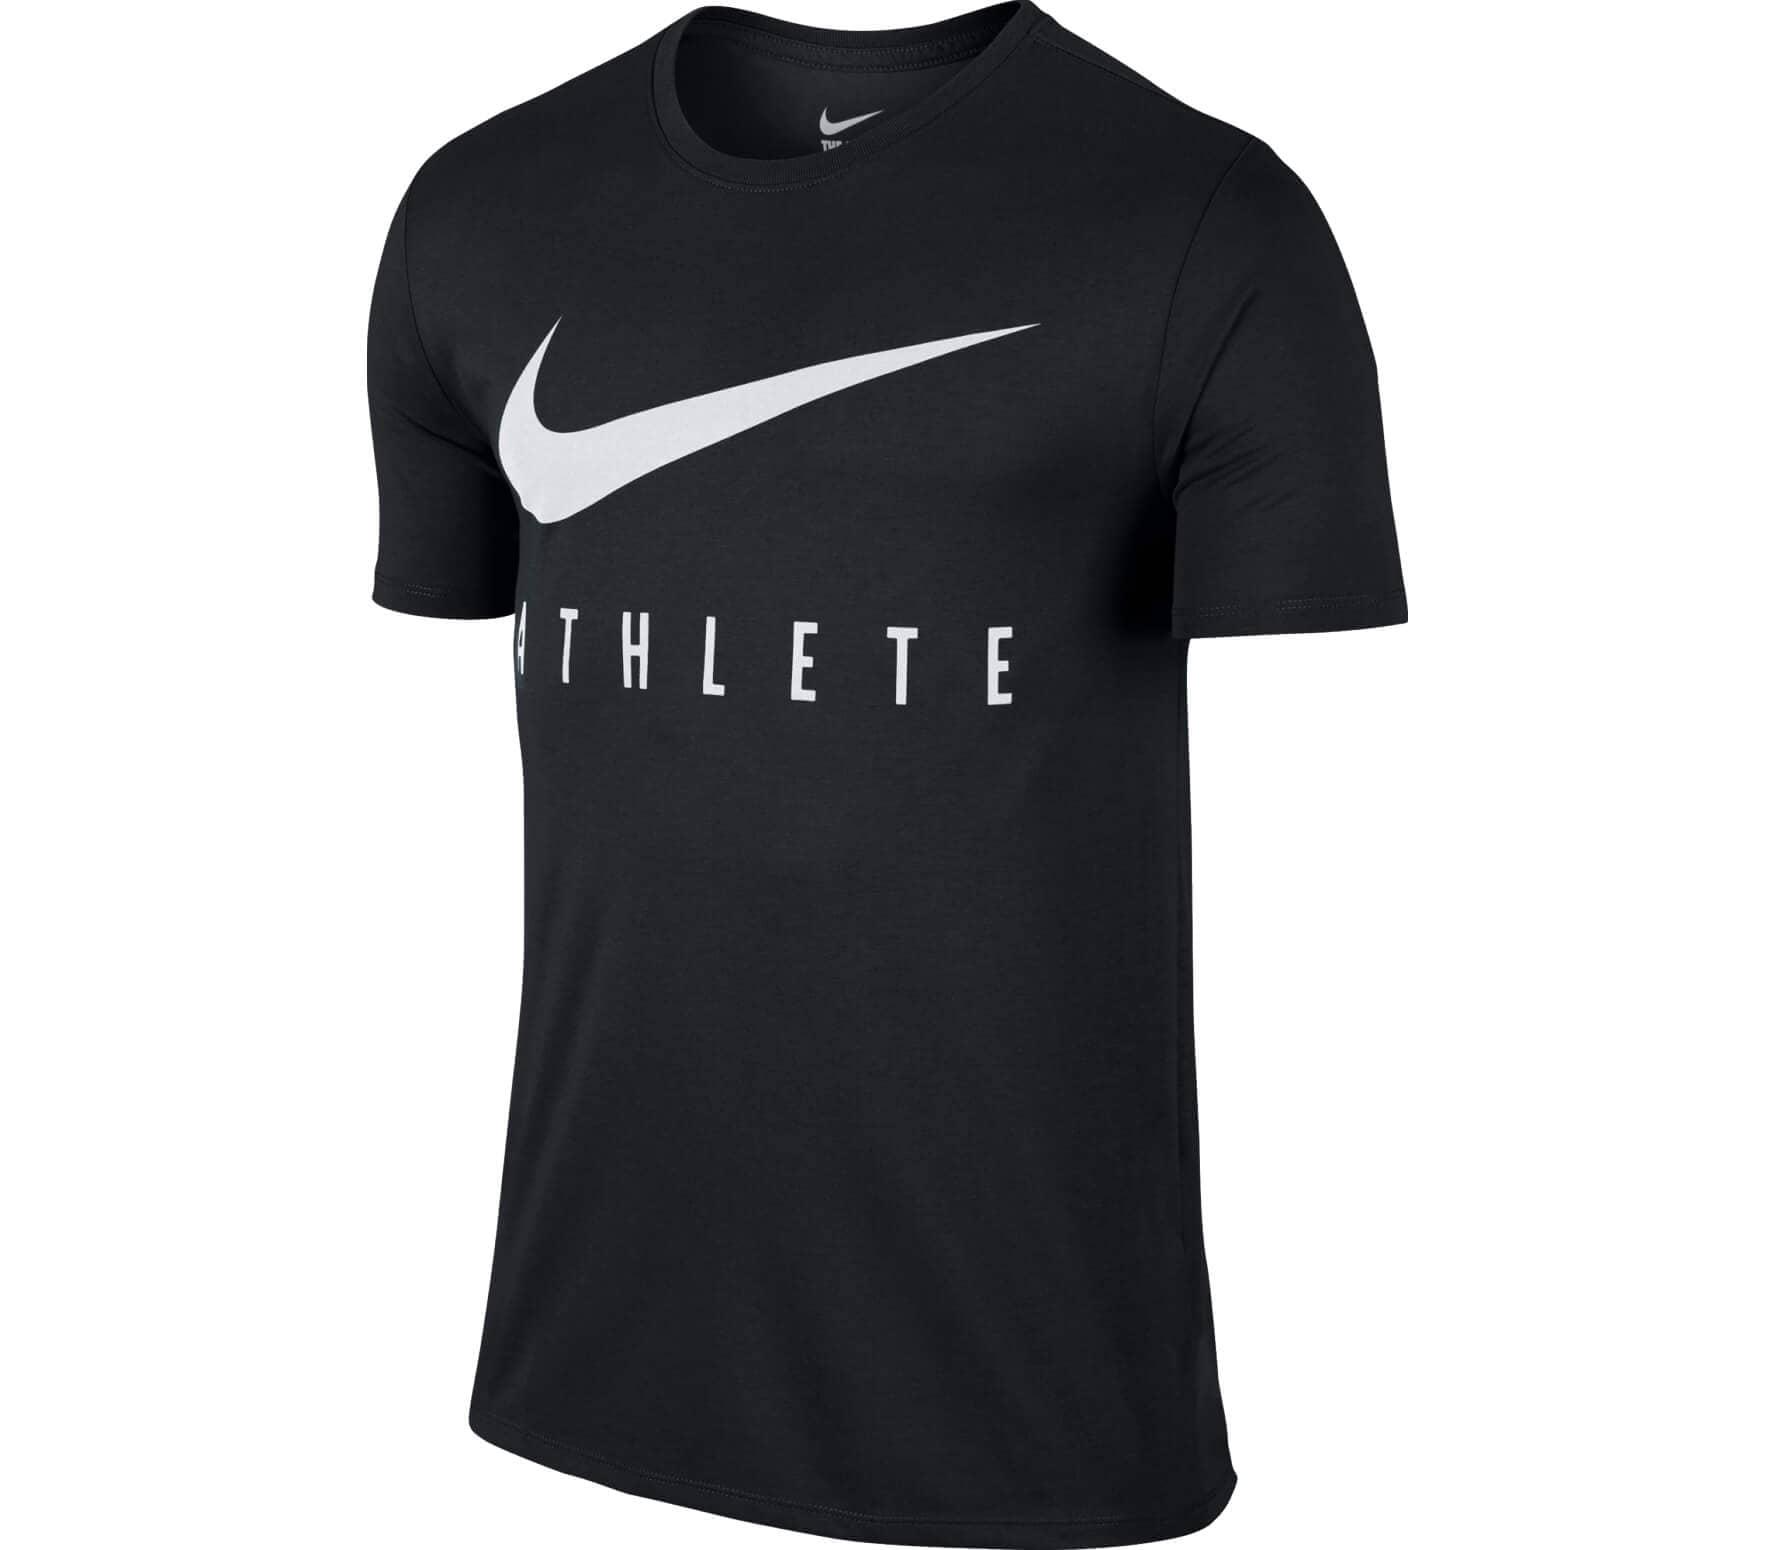 Zwart Heren T-shirt Nike Nike Dry Fit Swoosh - 739420 010